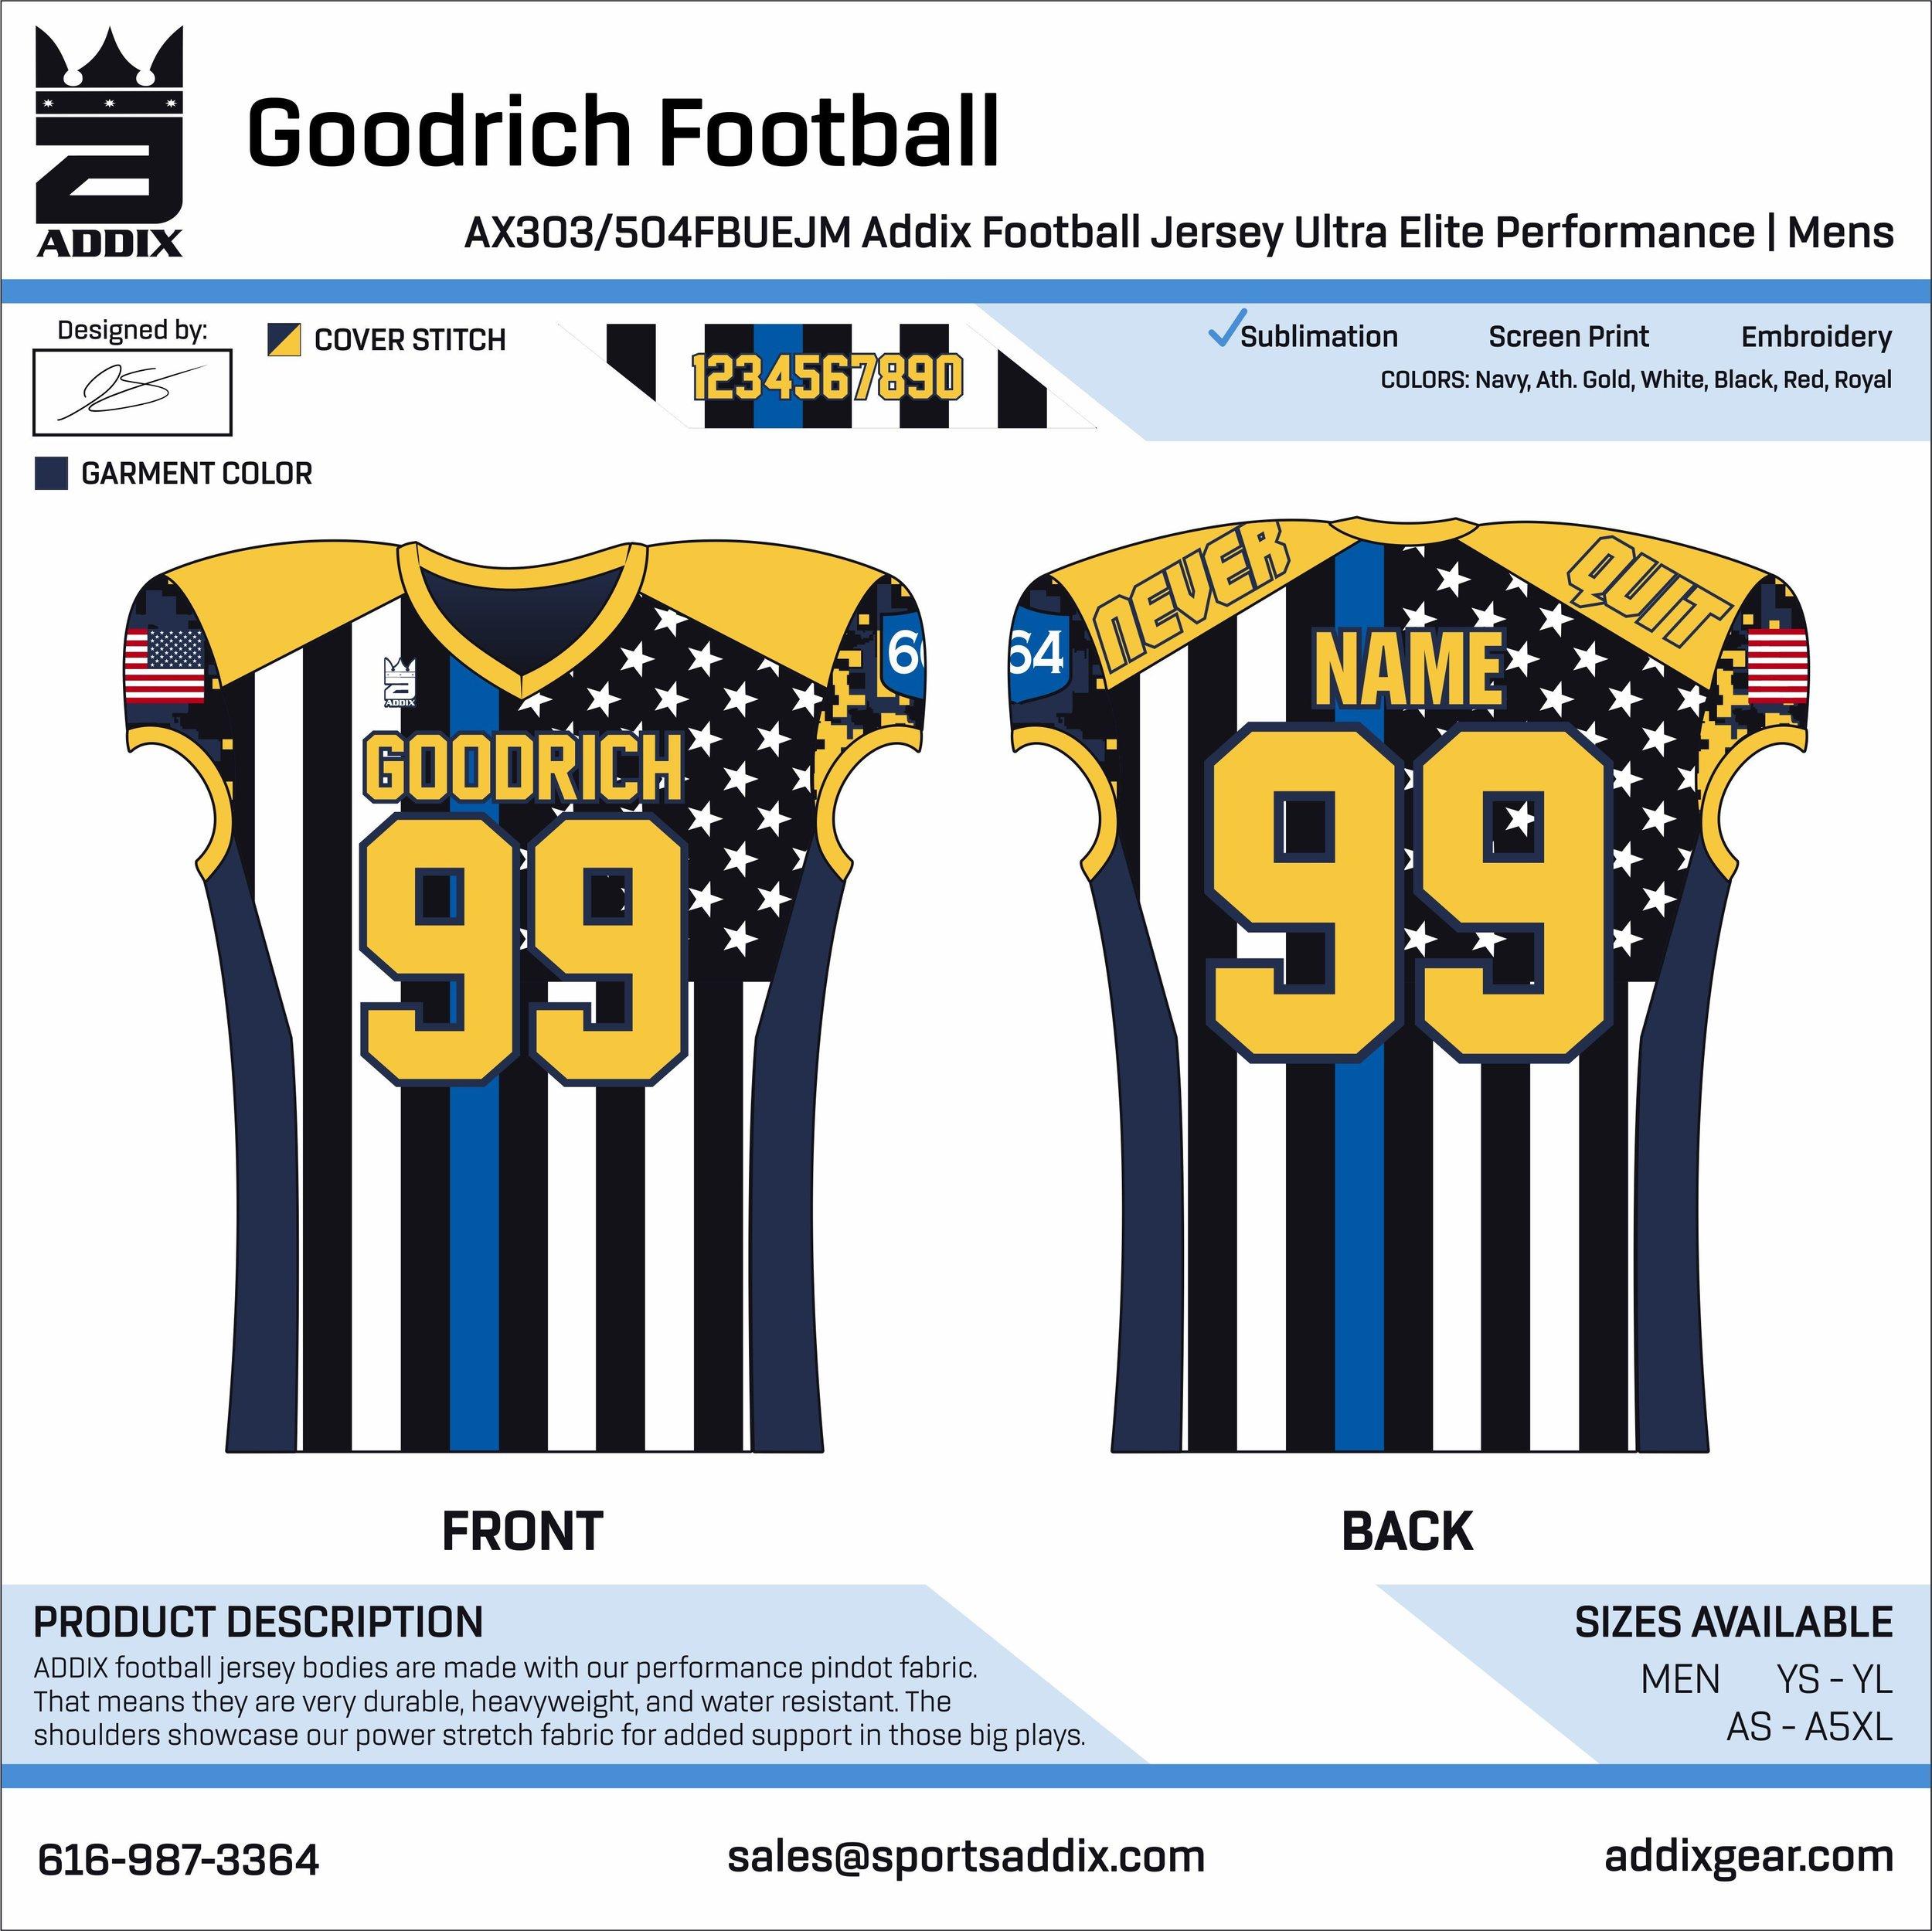 Goodrich Football_2018_8-6_JE_UEP Football Jersey.jpg